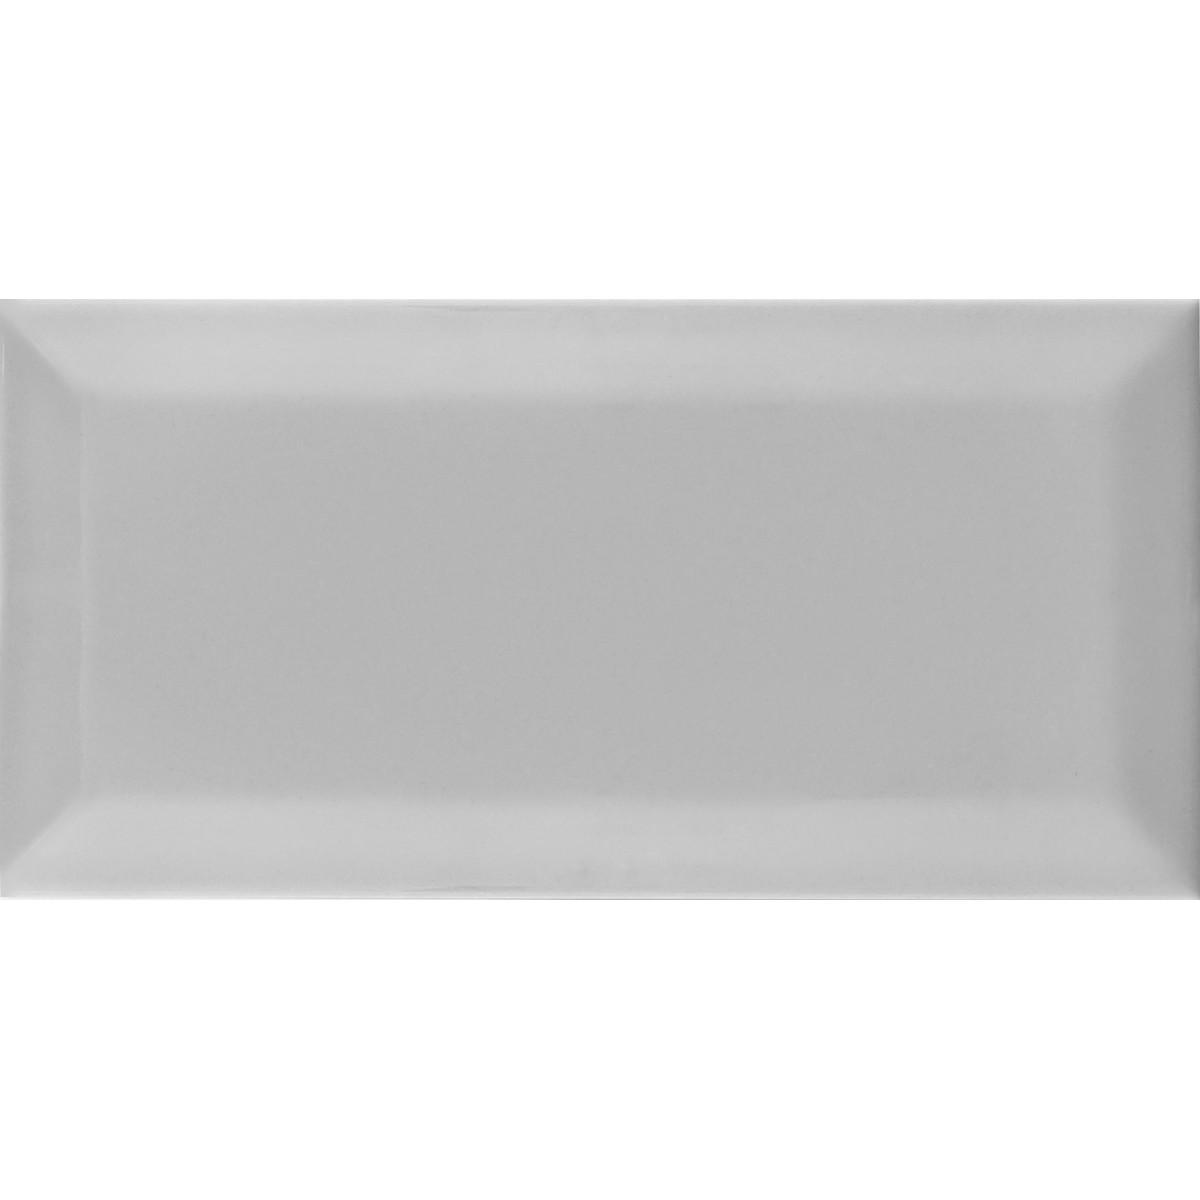 Плитка настенная Metrotiles 10x20 см 0.88 м2 цвет серый